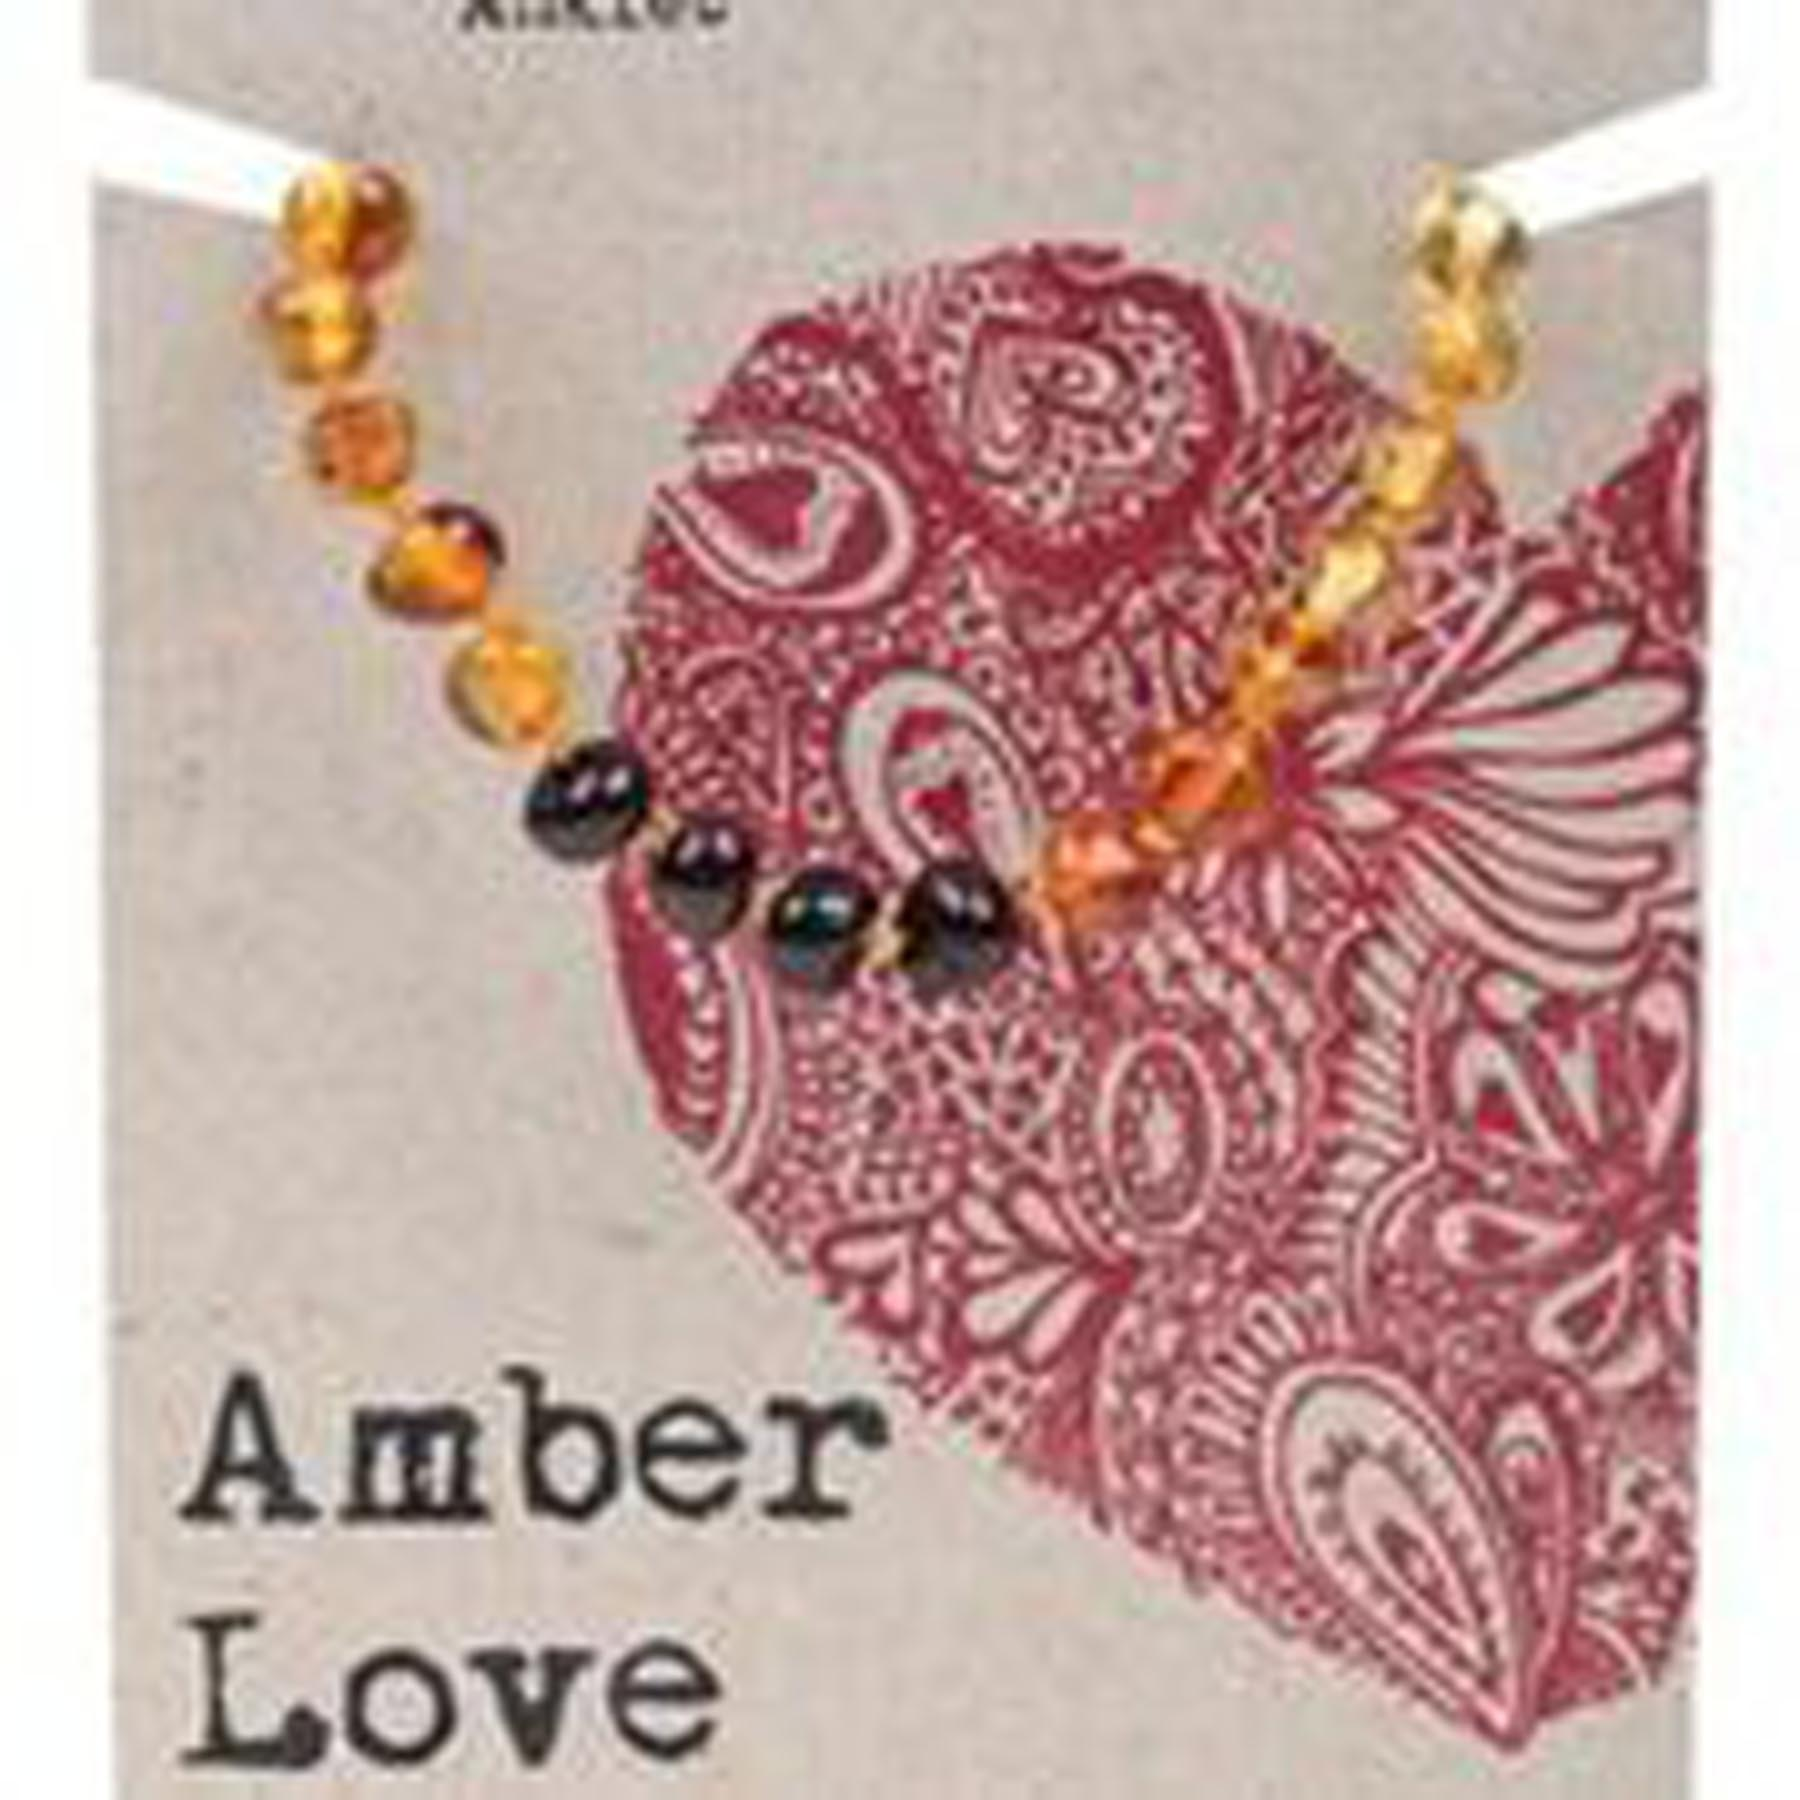 AMBER LOVE CHILD BRACELET / ANKLET RAINBOW LOVE www.motherbynature.com.au